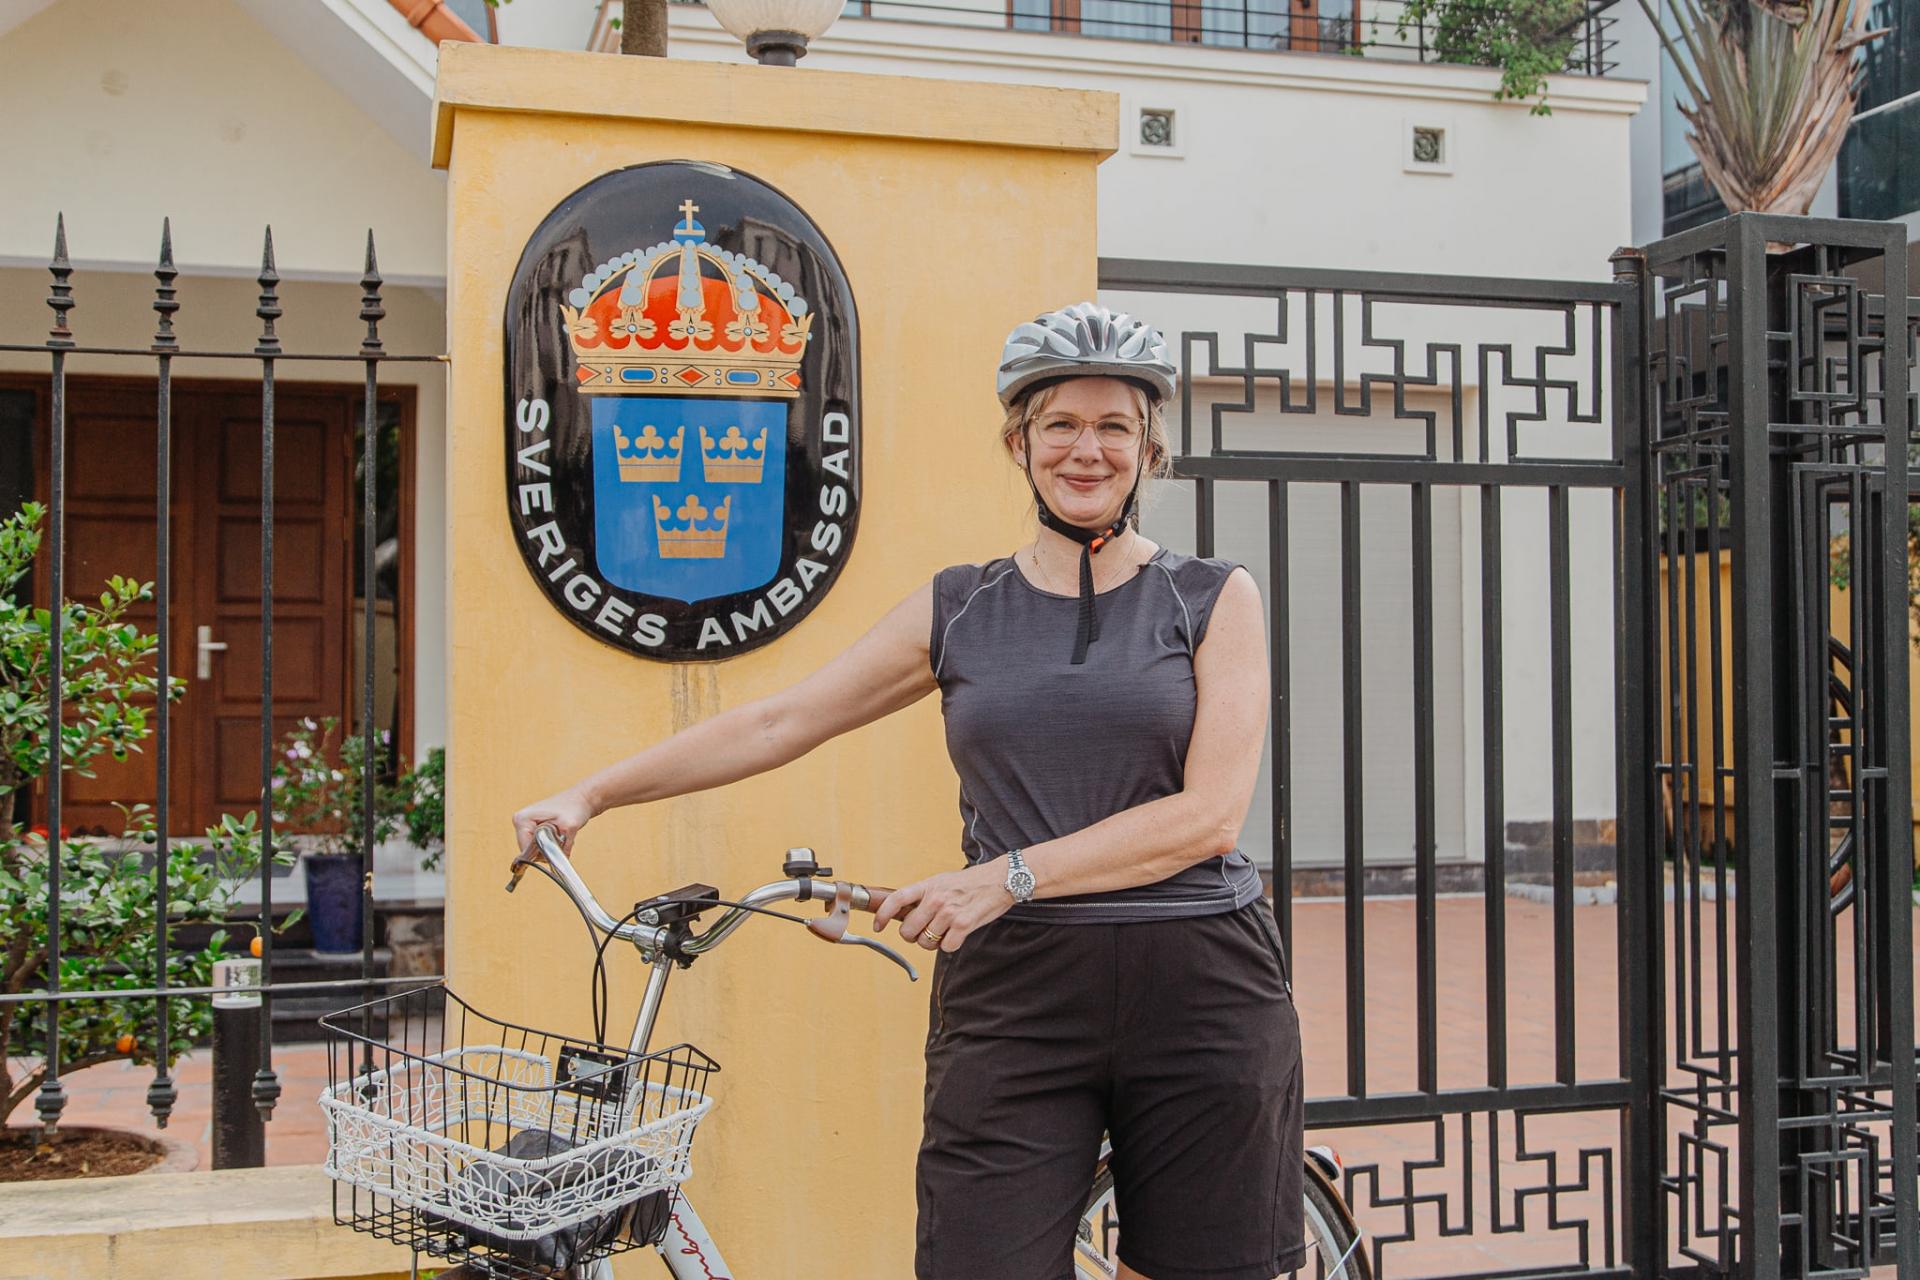 Ambassadors cycle on World Bicycle Day